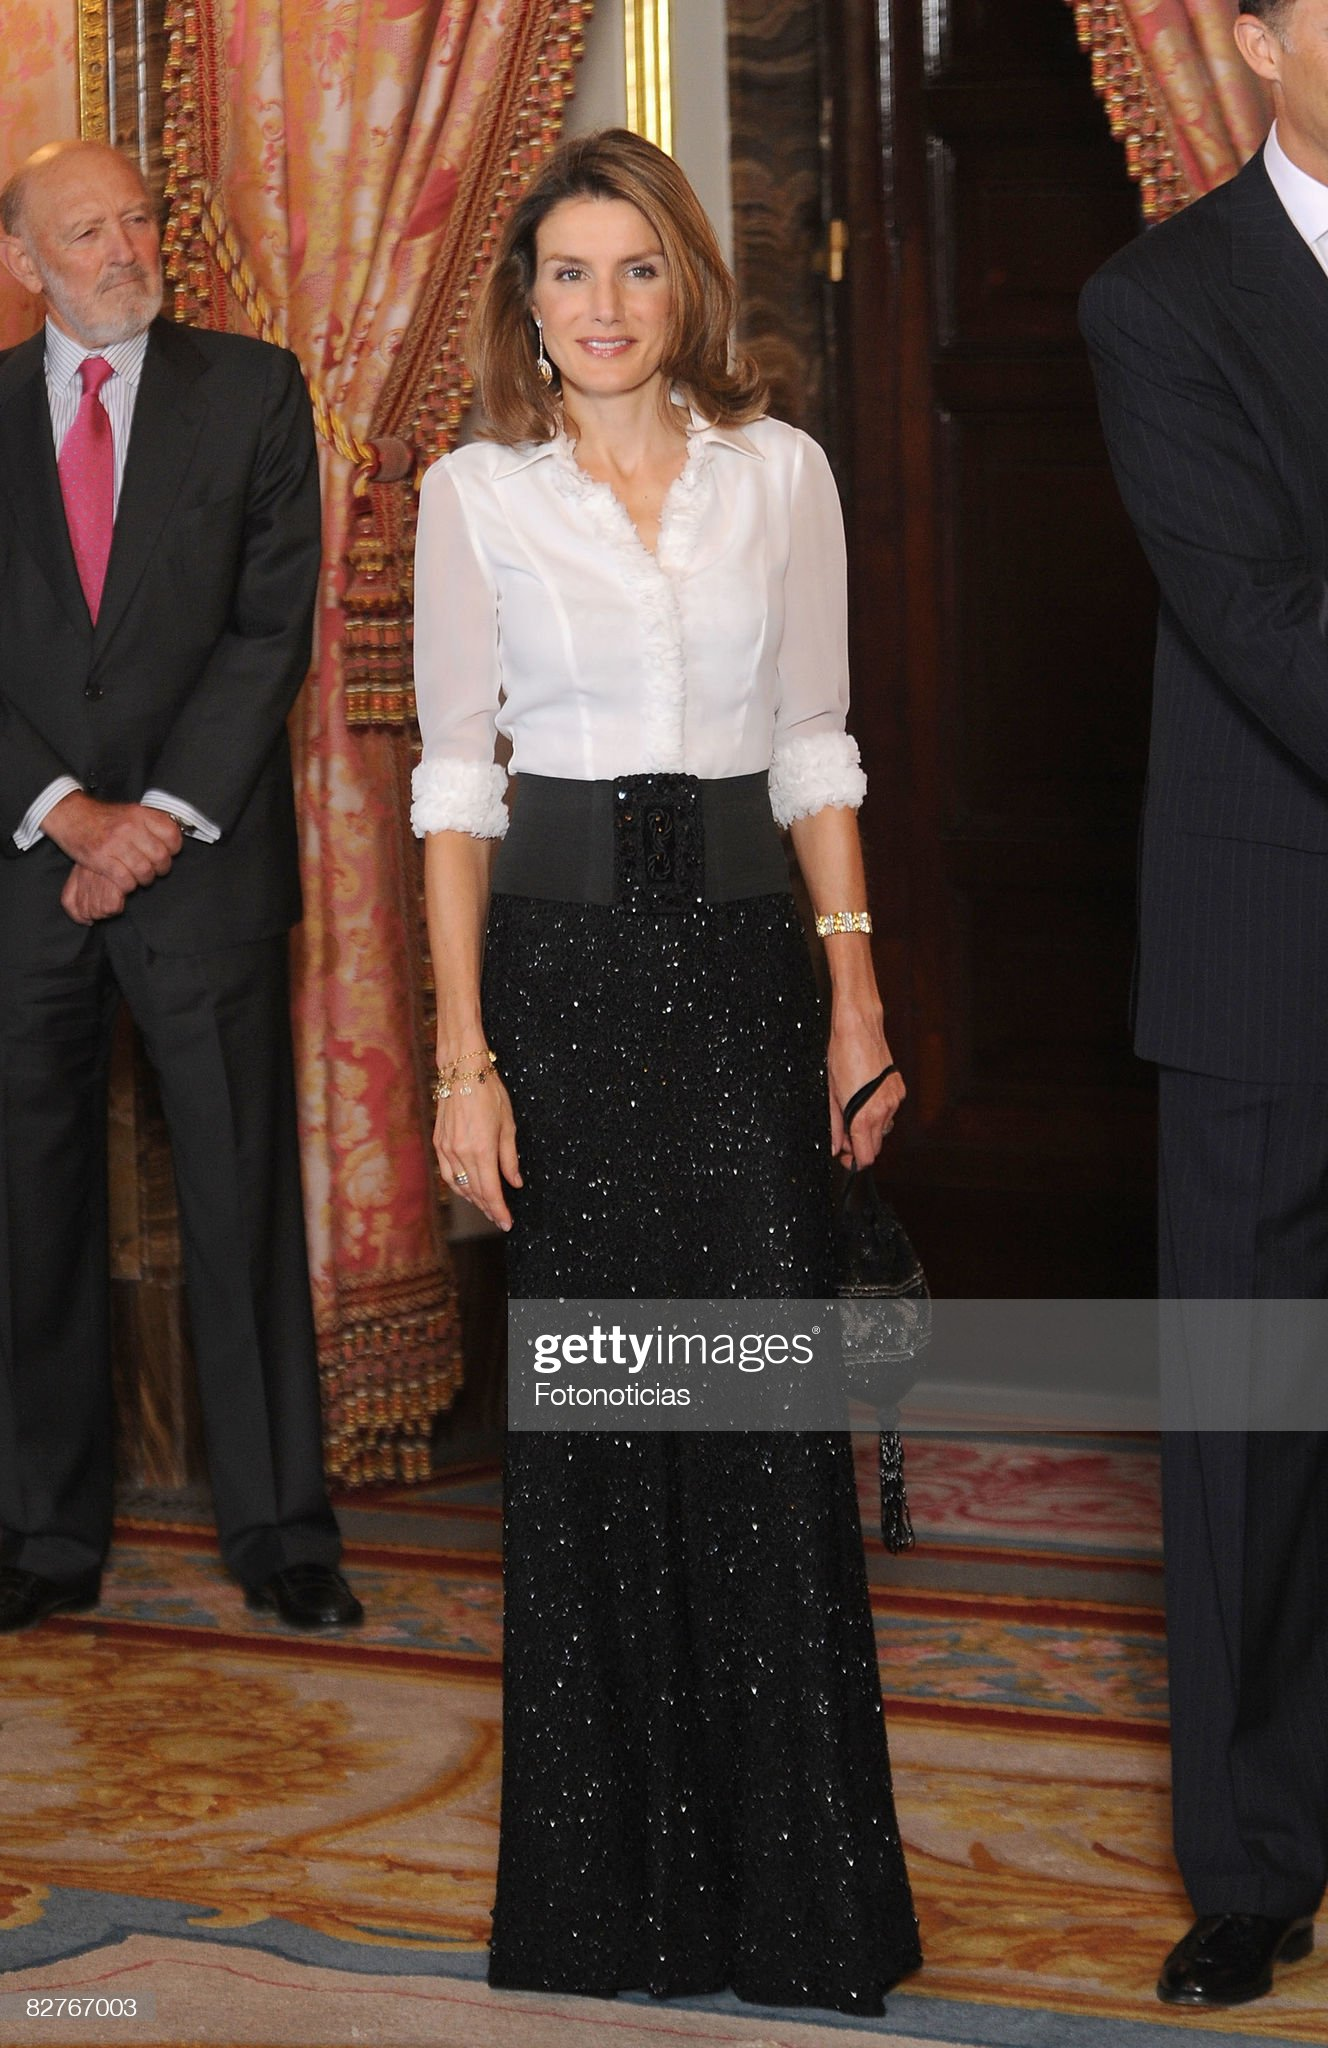 Spanish Royals Host Gala Dinner Honoring Costa Rica President : News Photo